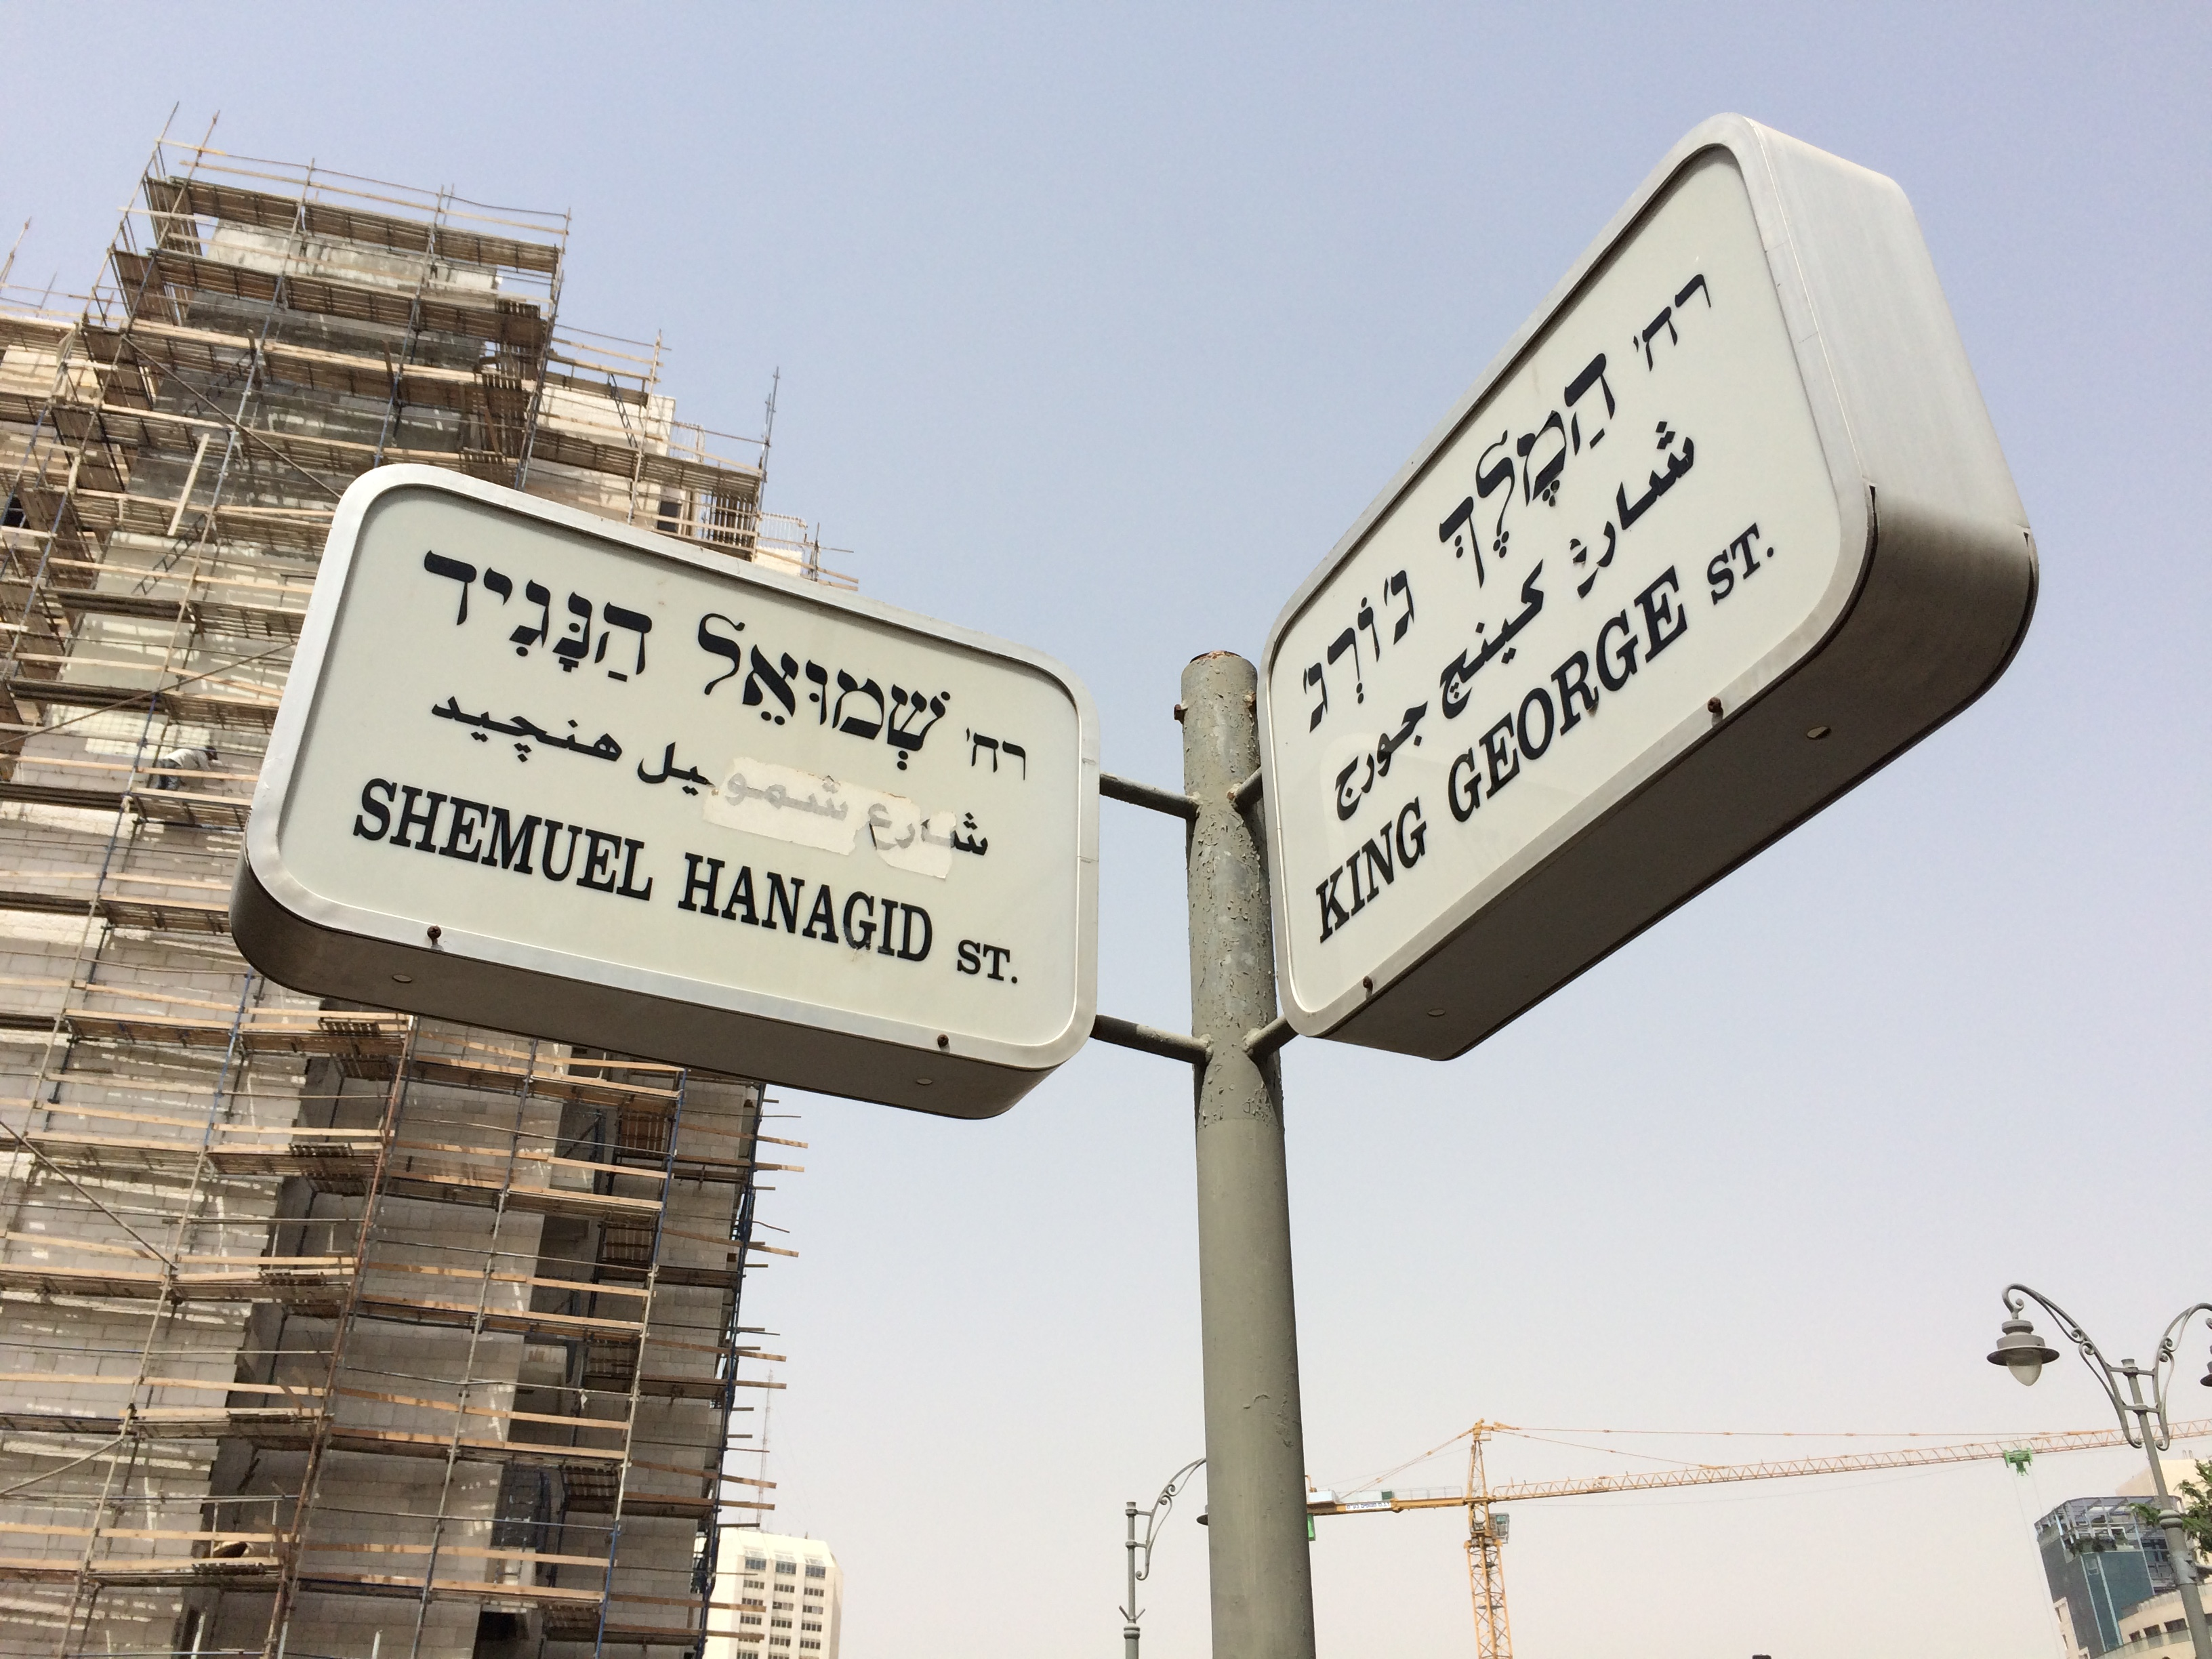 Jutzot Ierushalaim – XIII – Las calles de Jerusalém: Shmuel HaNaguid